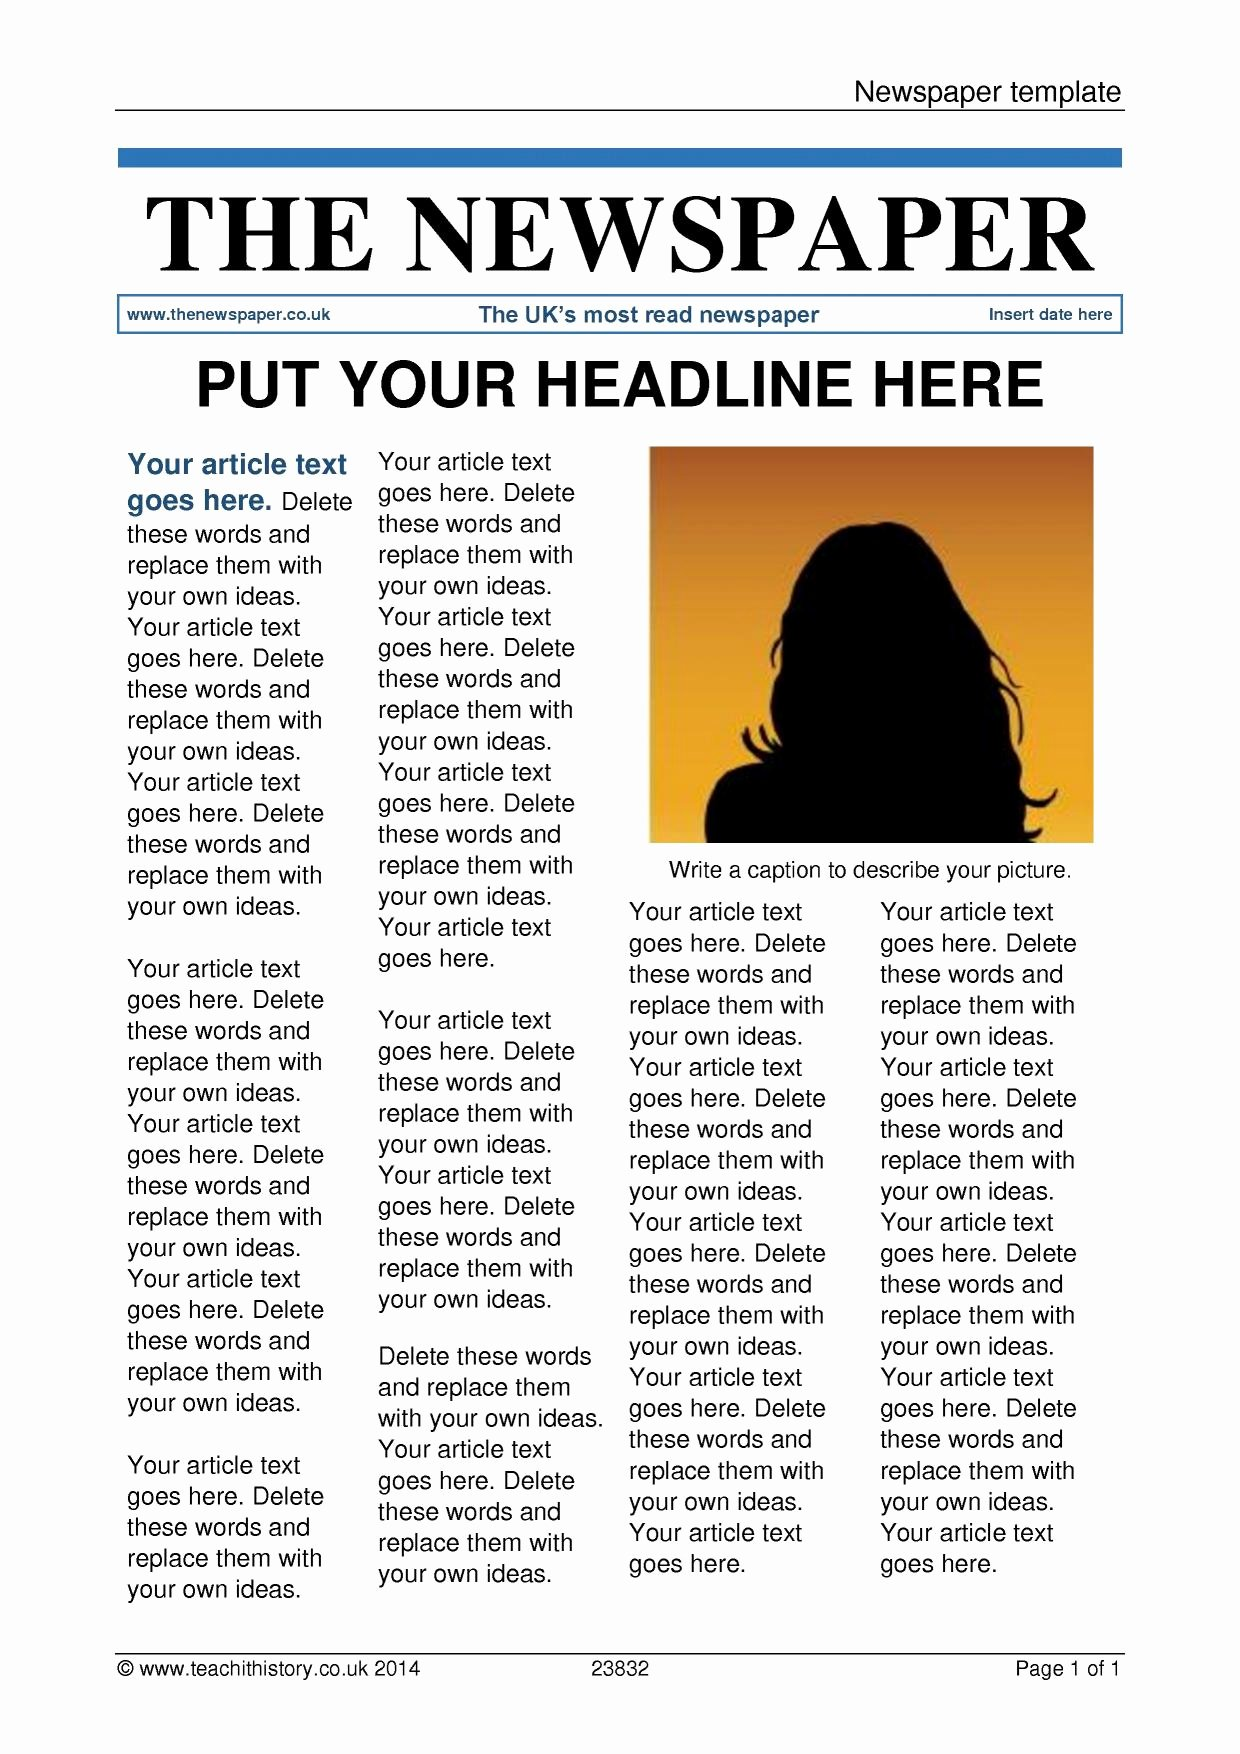 Microsoft Publisher Newspaper Templates Luxury Newspaper Article Template for Microsoft Publisher Ideas